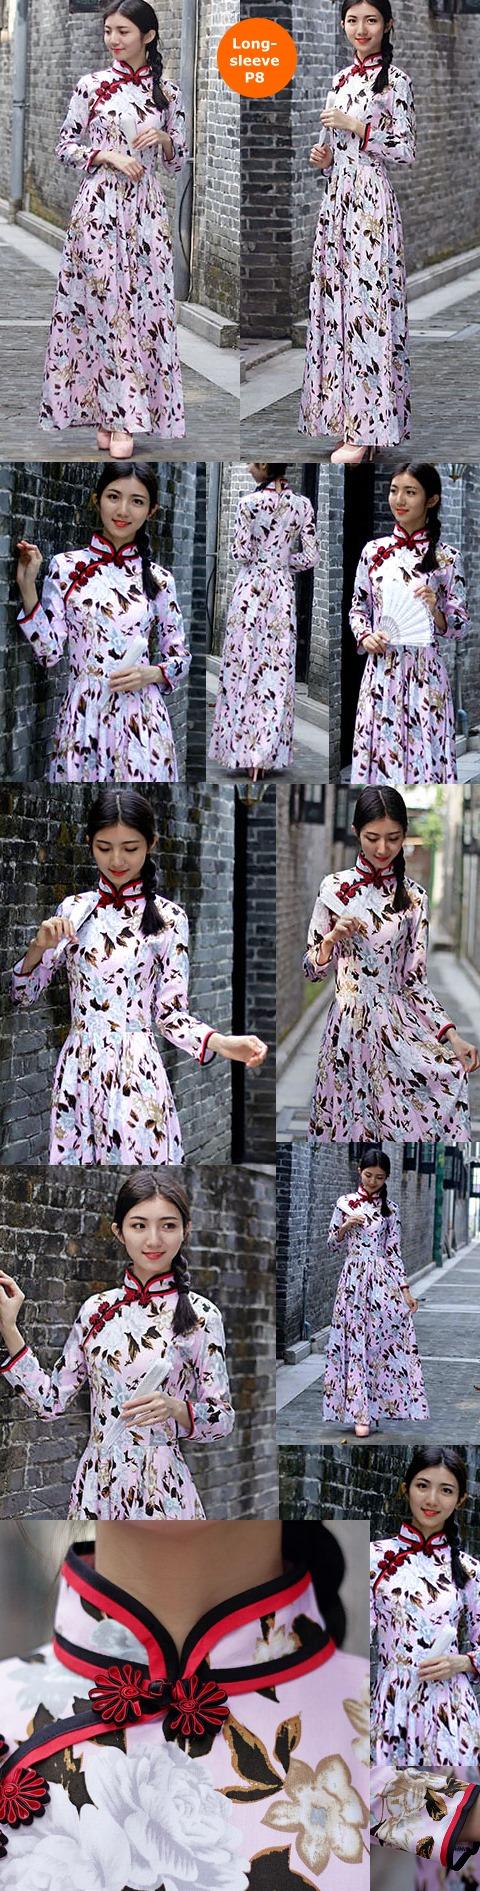 Long-length Cotton Printing Cheongsam Dress